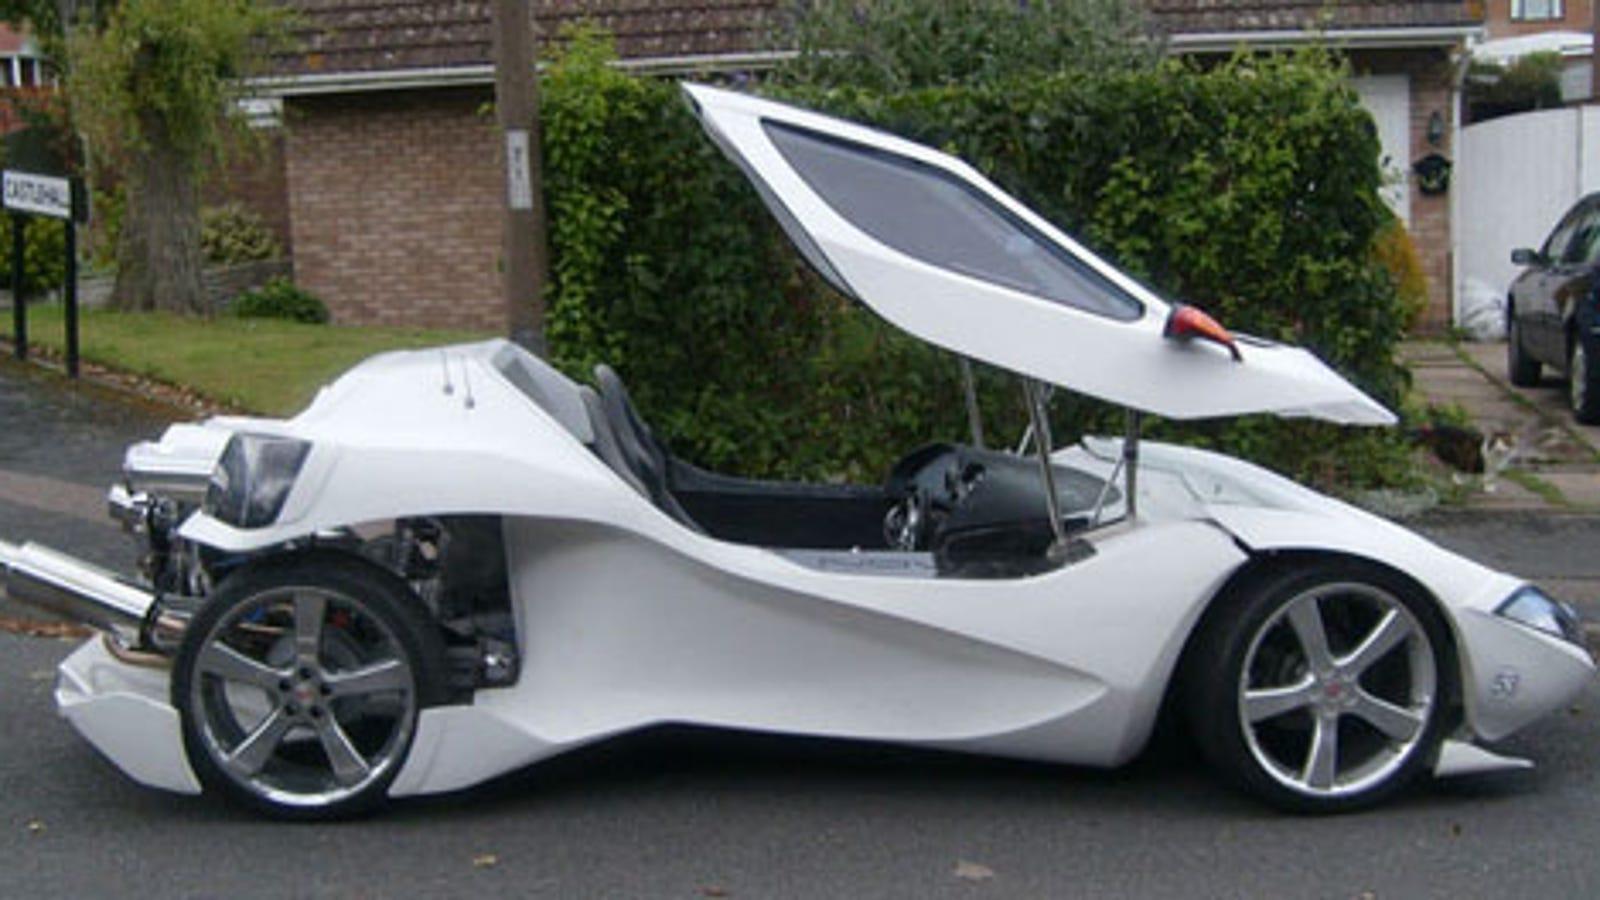 HYUNDAI COUPE Sports Car Koolart Chrome Keyring Picture Both Sides